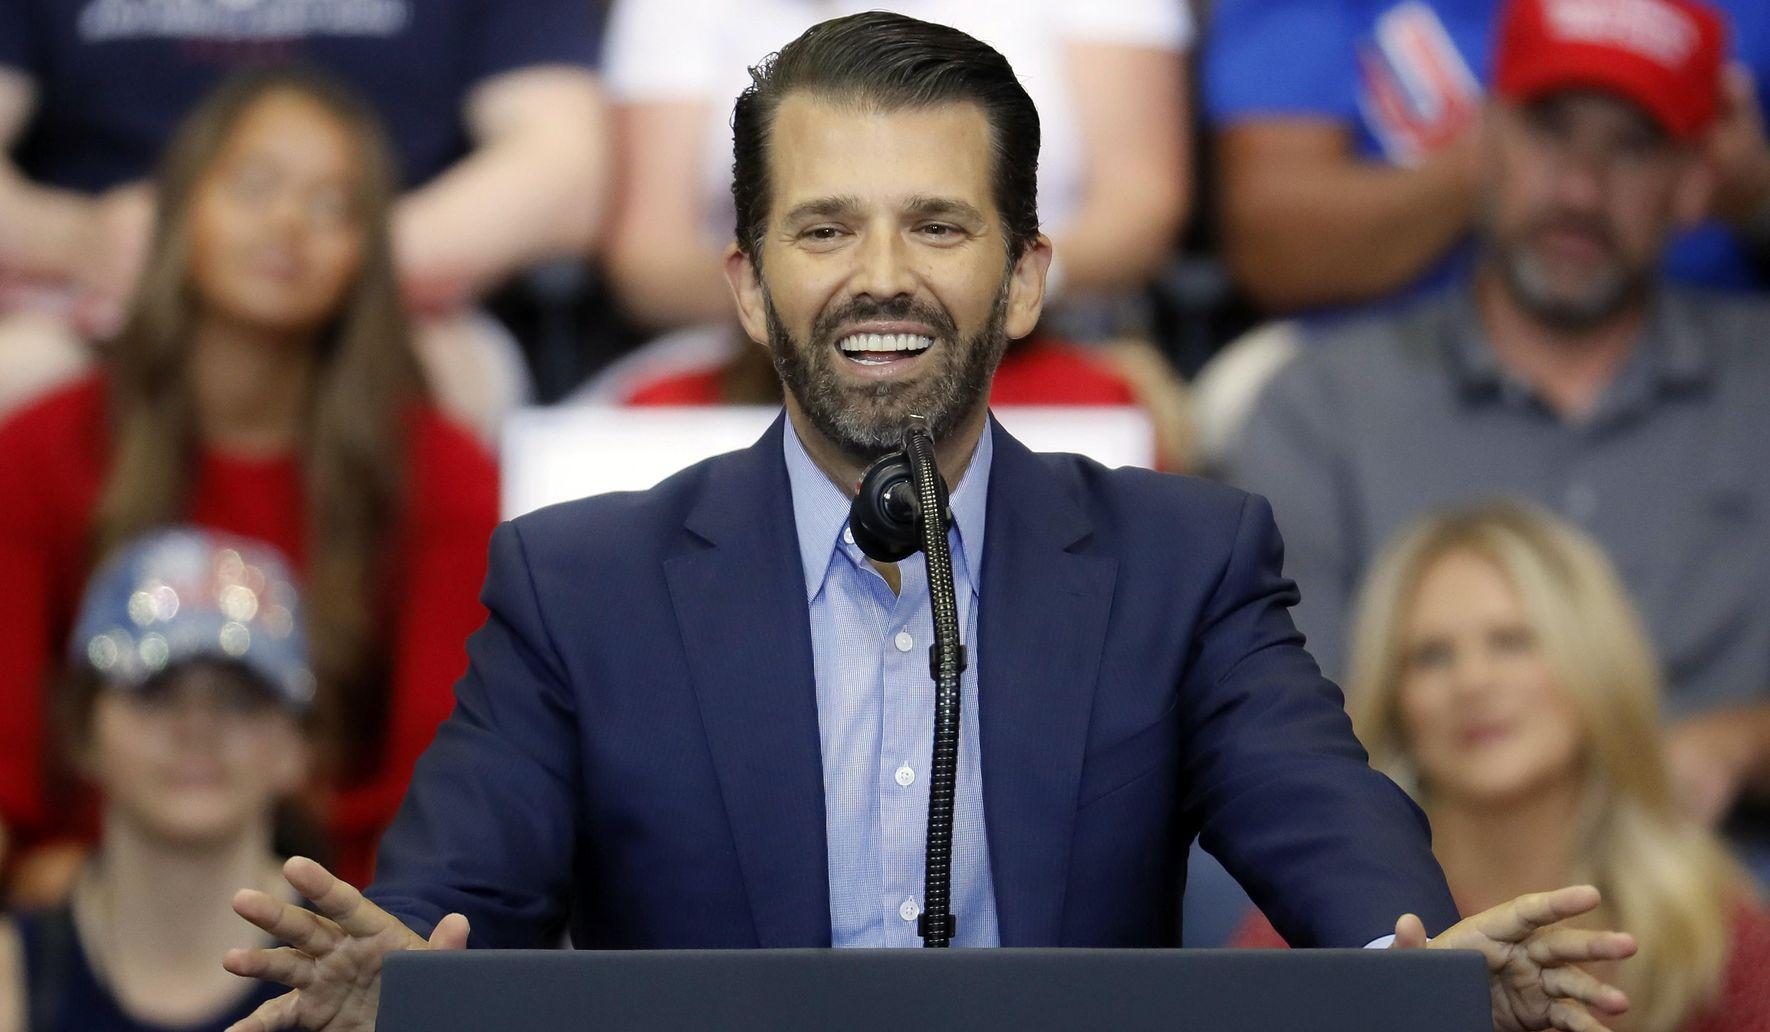 'He's the future': Donald Trump Jr. '2024' chants underscore rising stardom